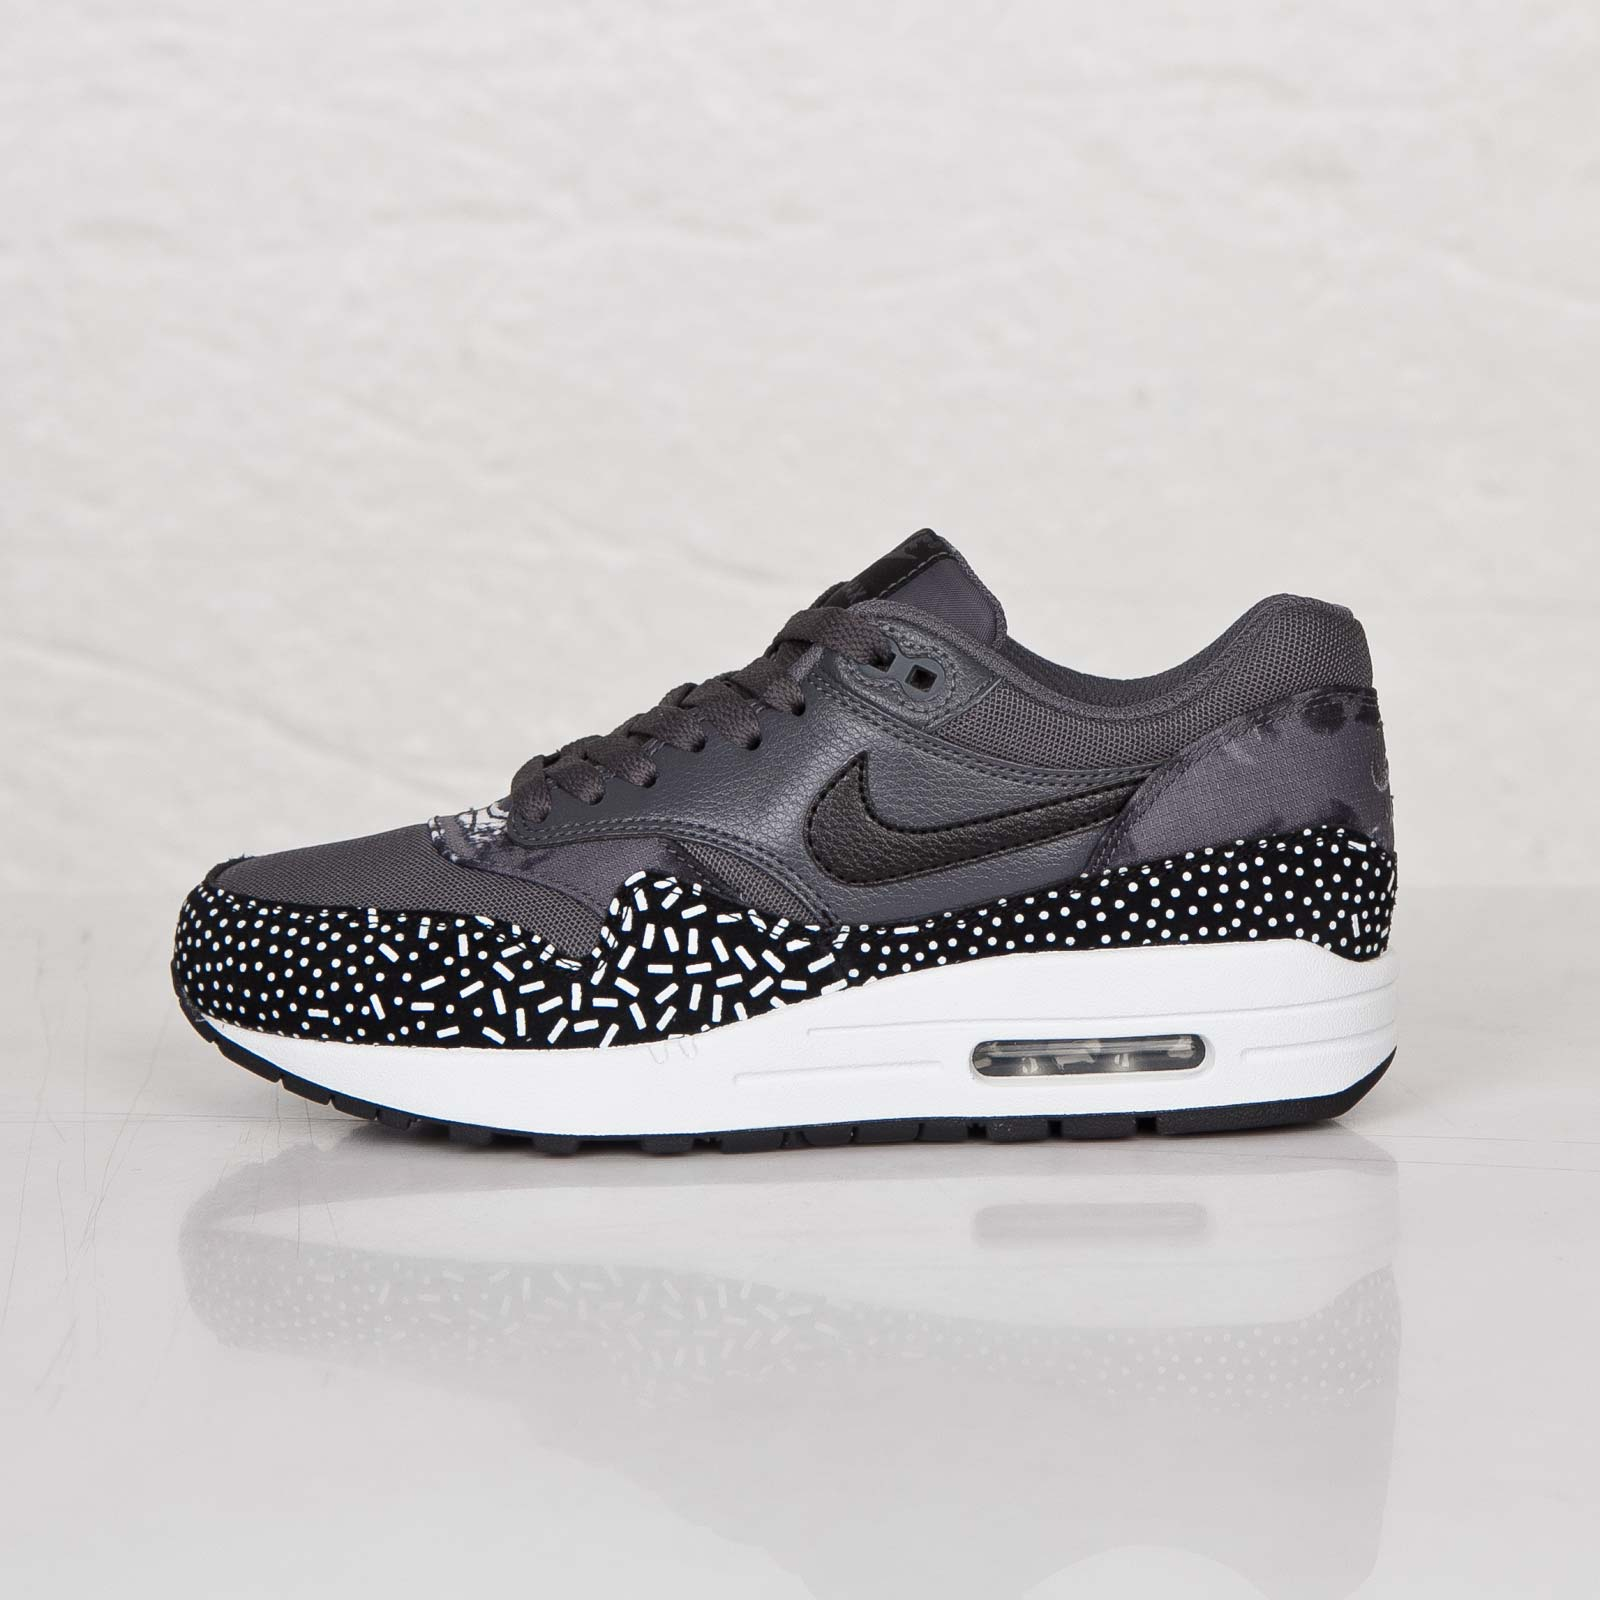 Nike Wmns Air Max 1 Print 528898 001 Sneakersnstuff